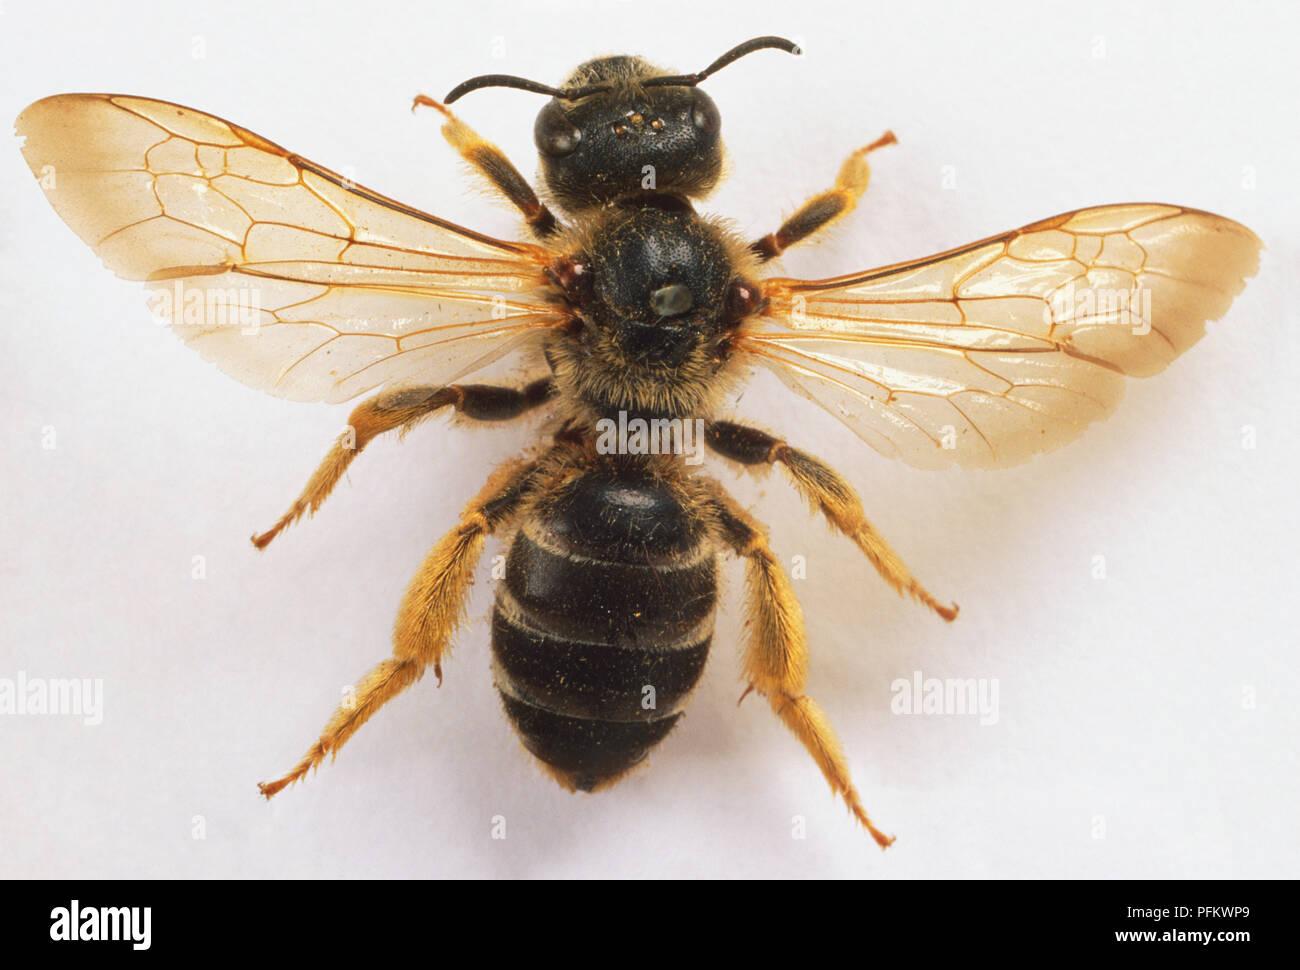 Halictus quadricinctus, sweat bee, close up - Stock Image